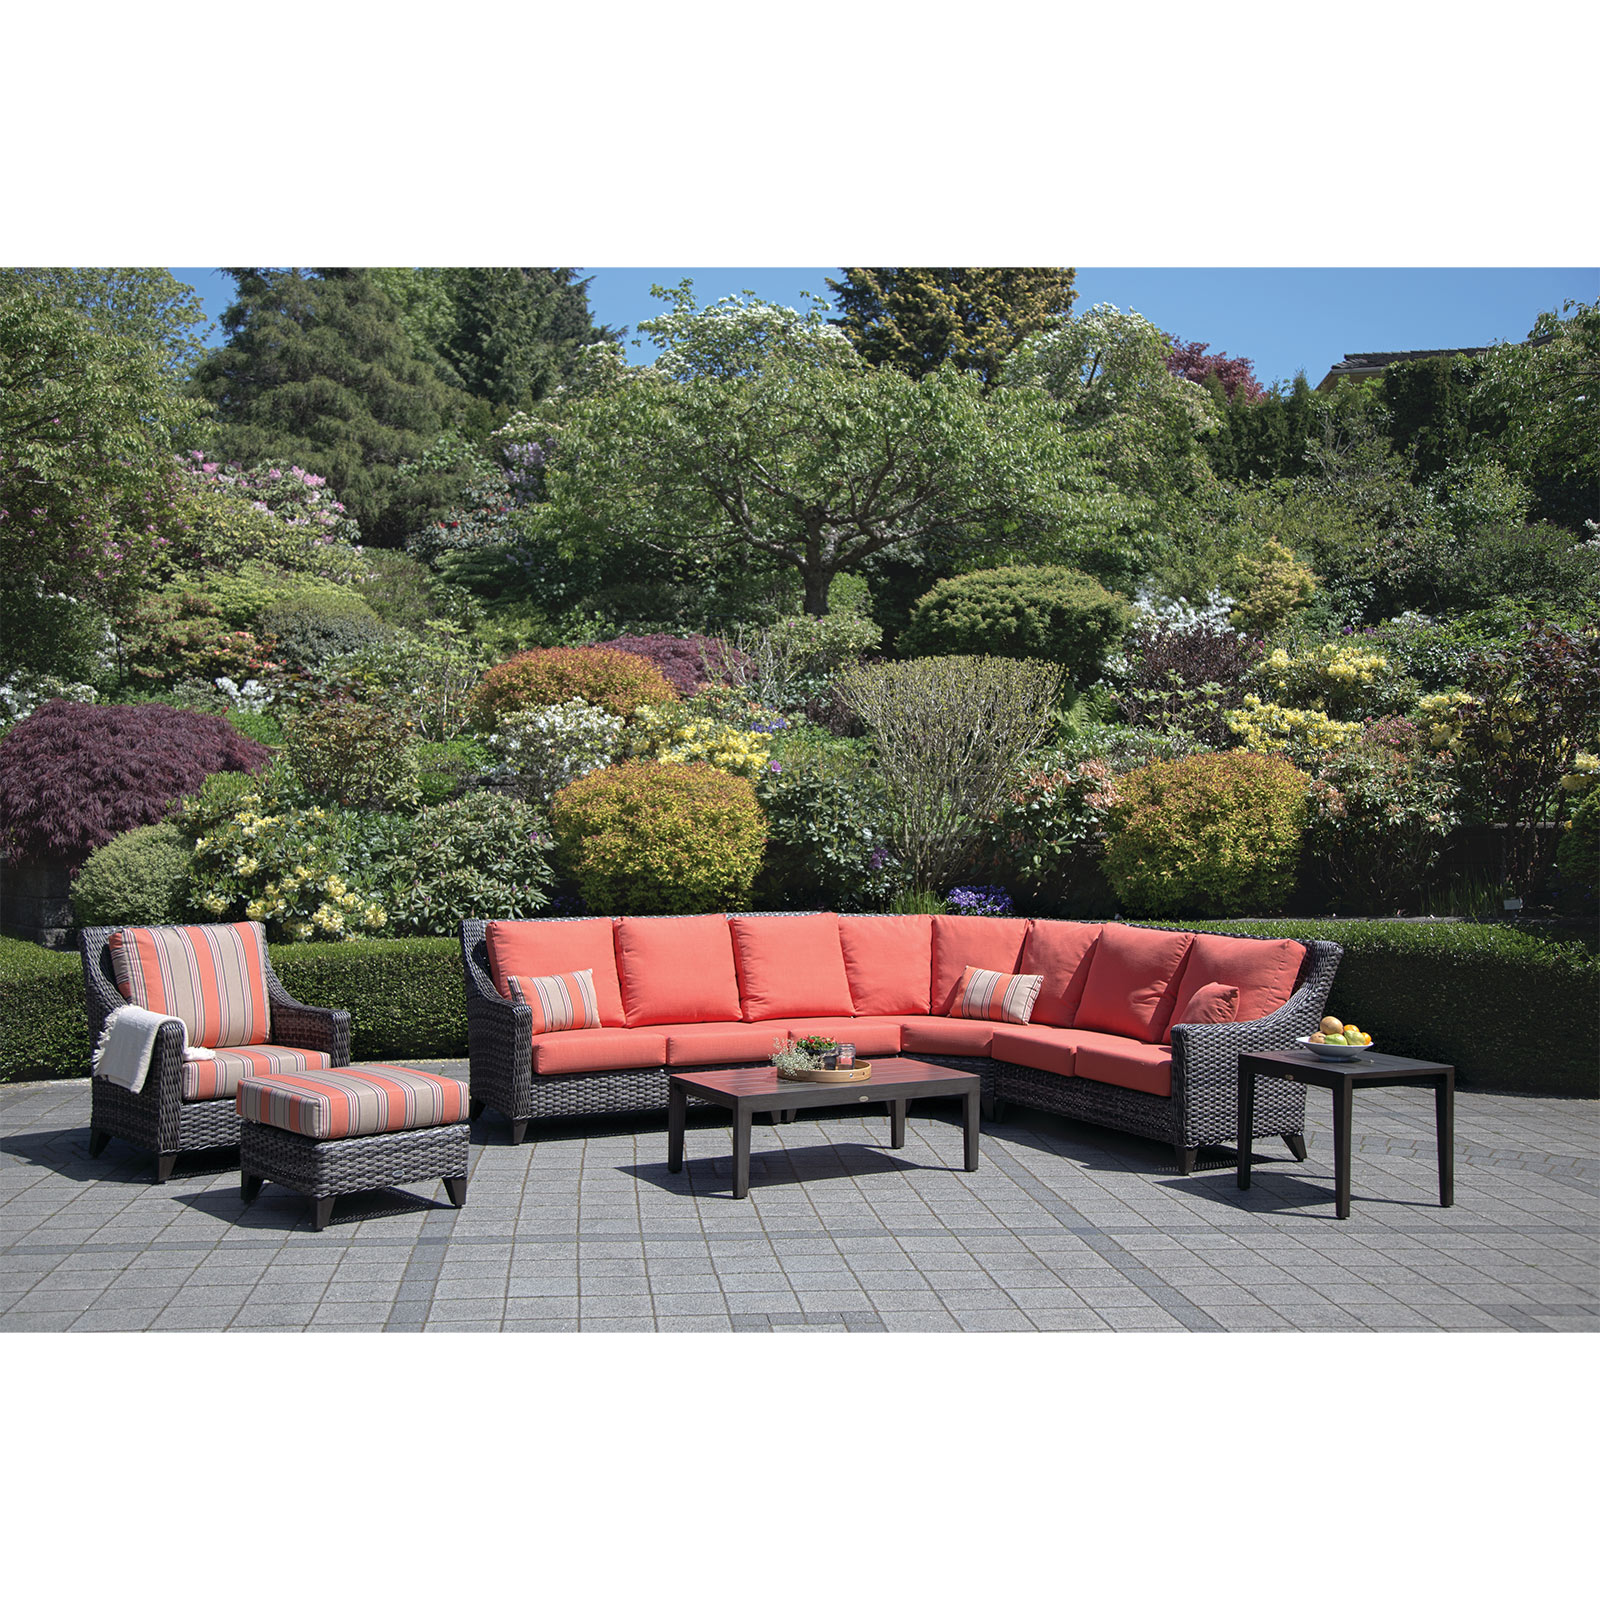 Ratana St Martin Outdoor Furniture Collection